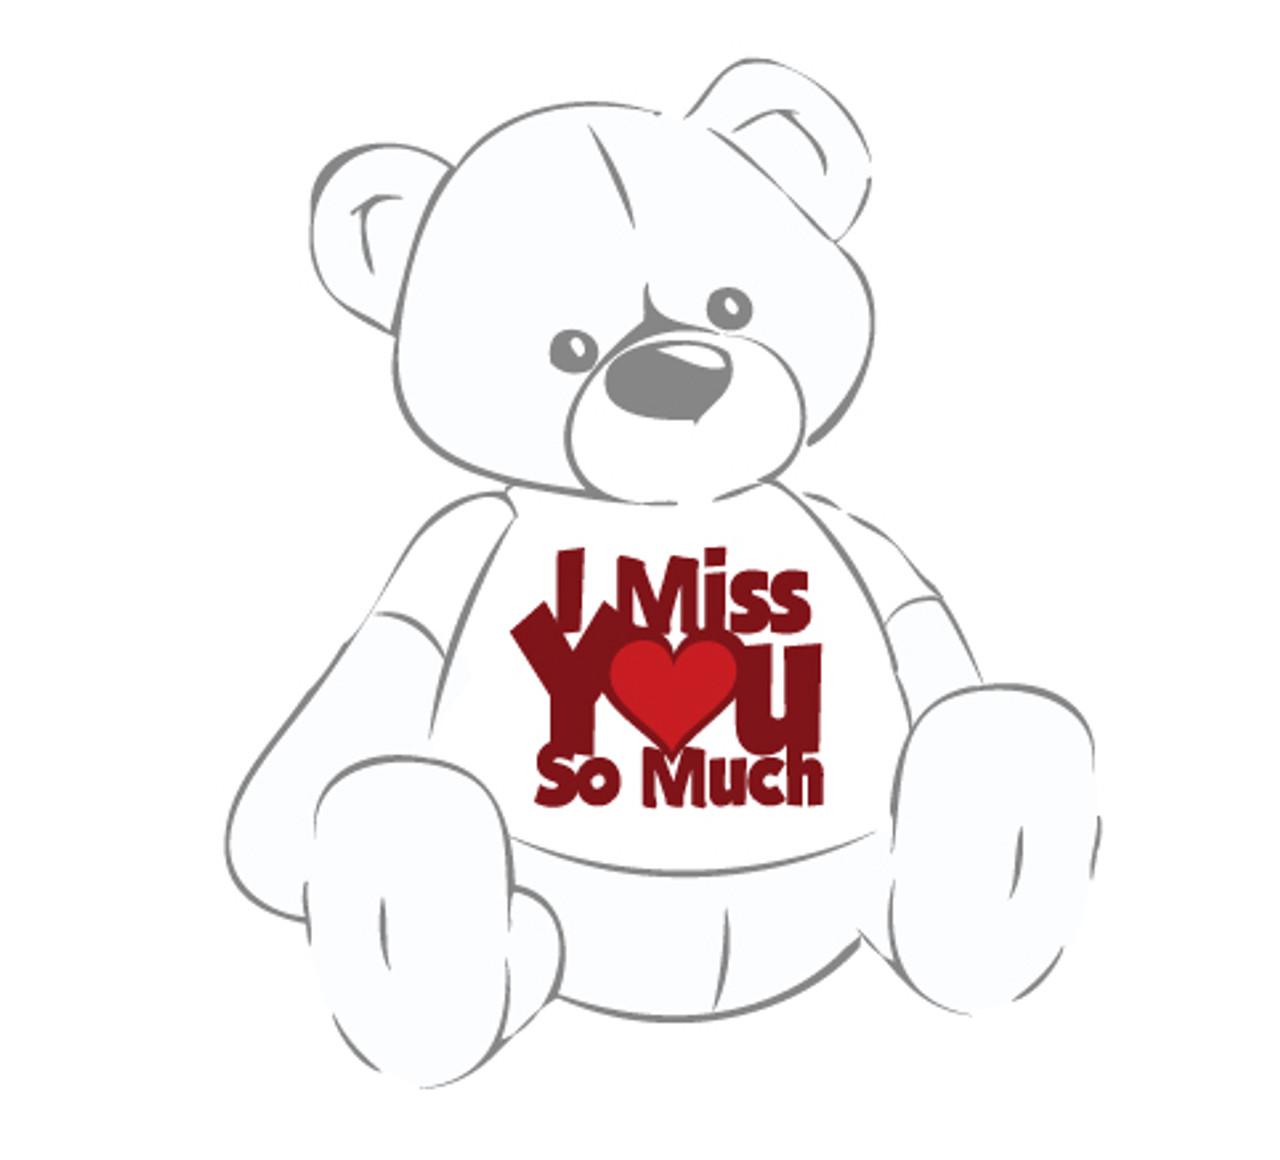 Giant Teddy Bear I Miss You So Much T-shirt